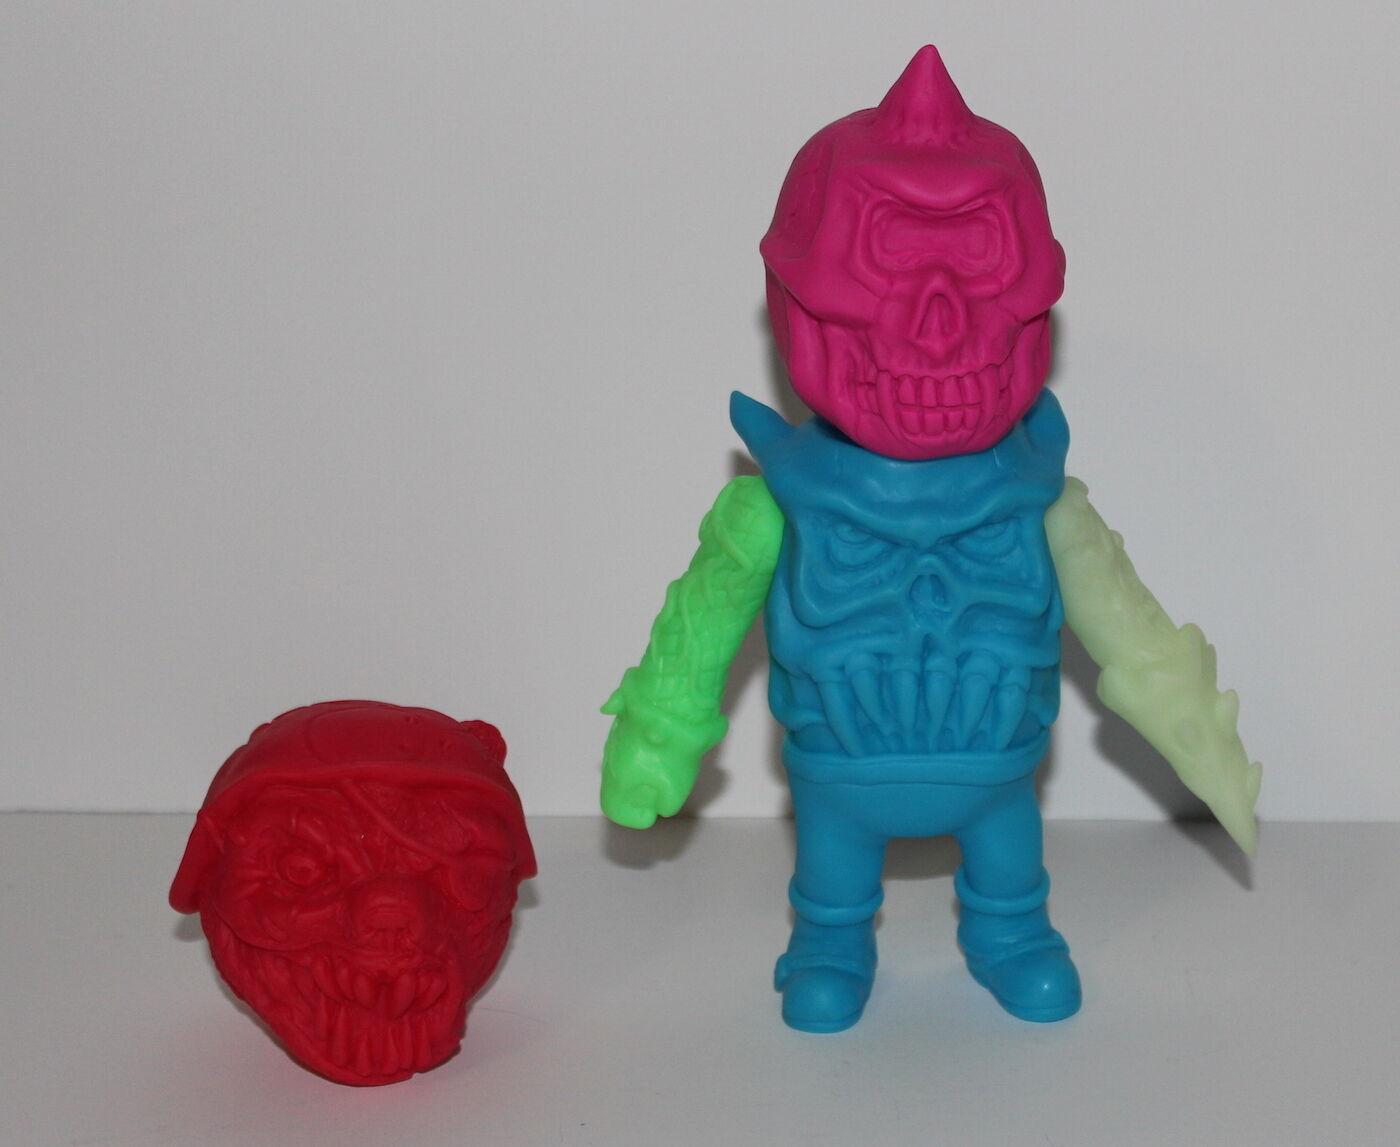 Unpainted Mixed Parts Mishka Bootleg Kaiju with Bear Bear Bear Head Toy Collectible ef07ce